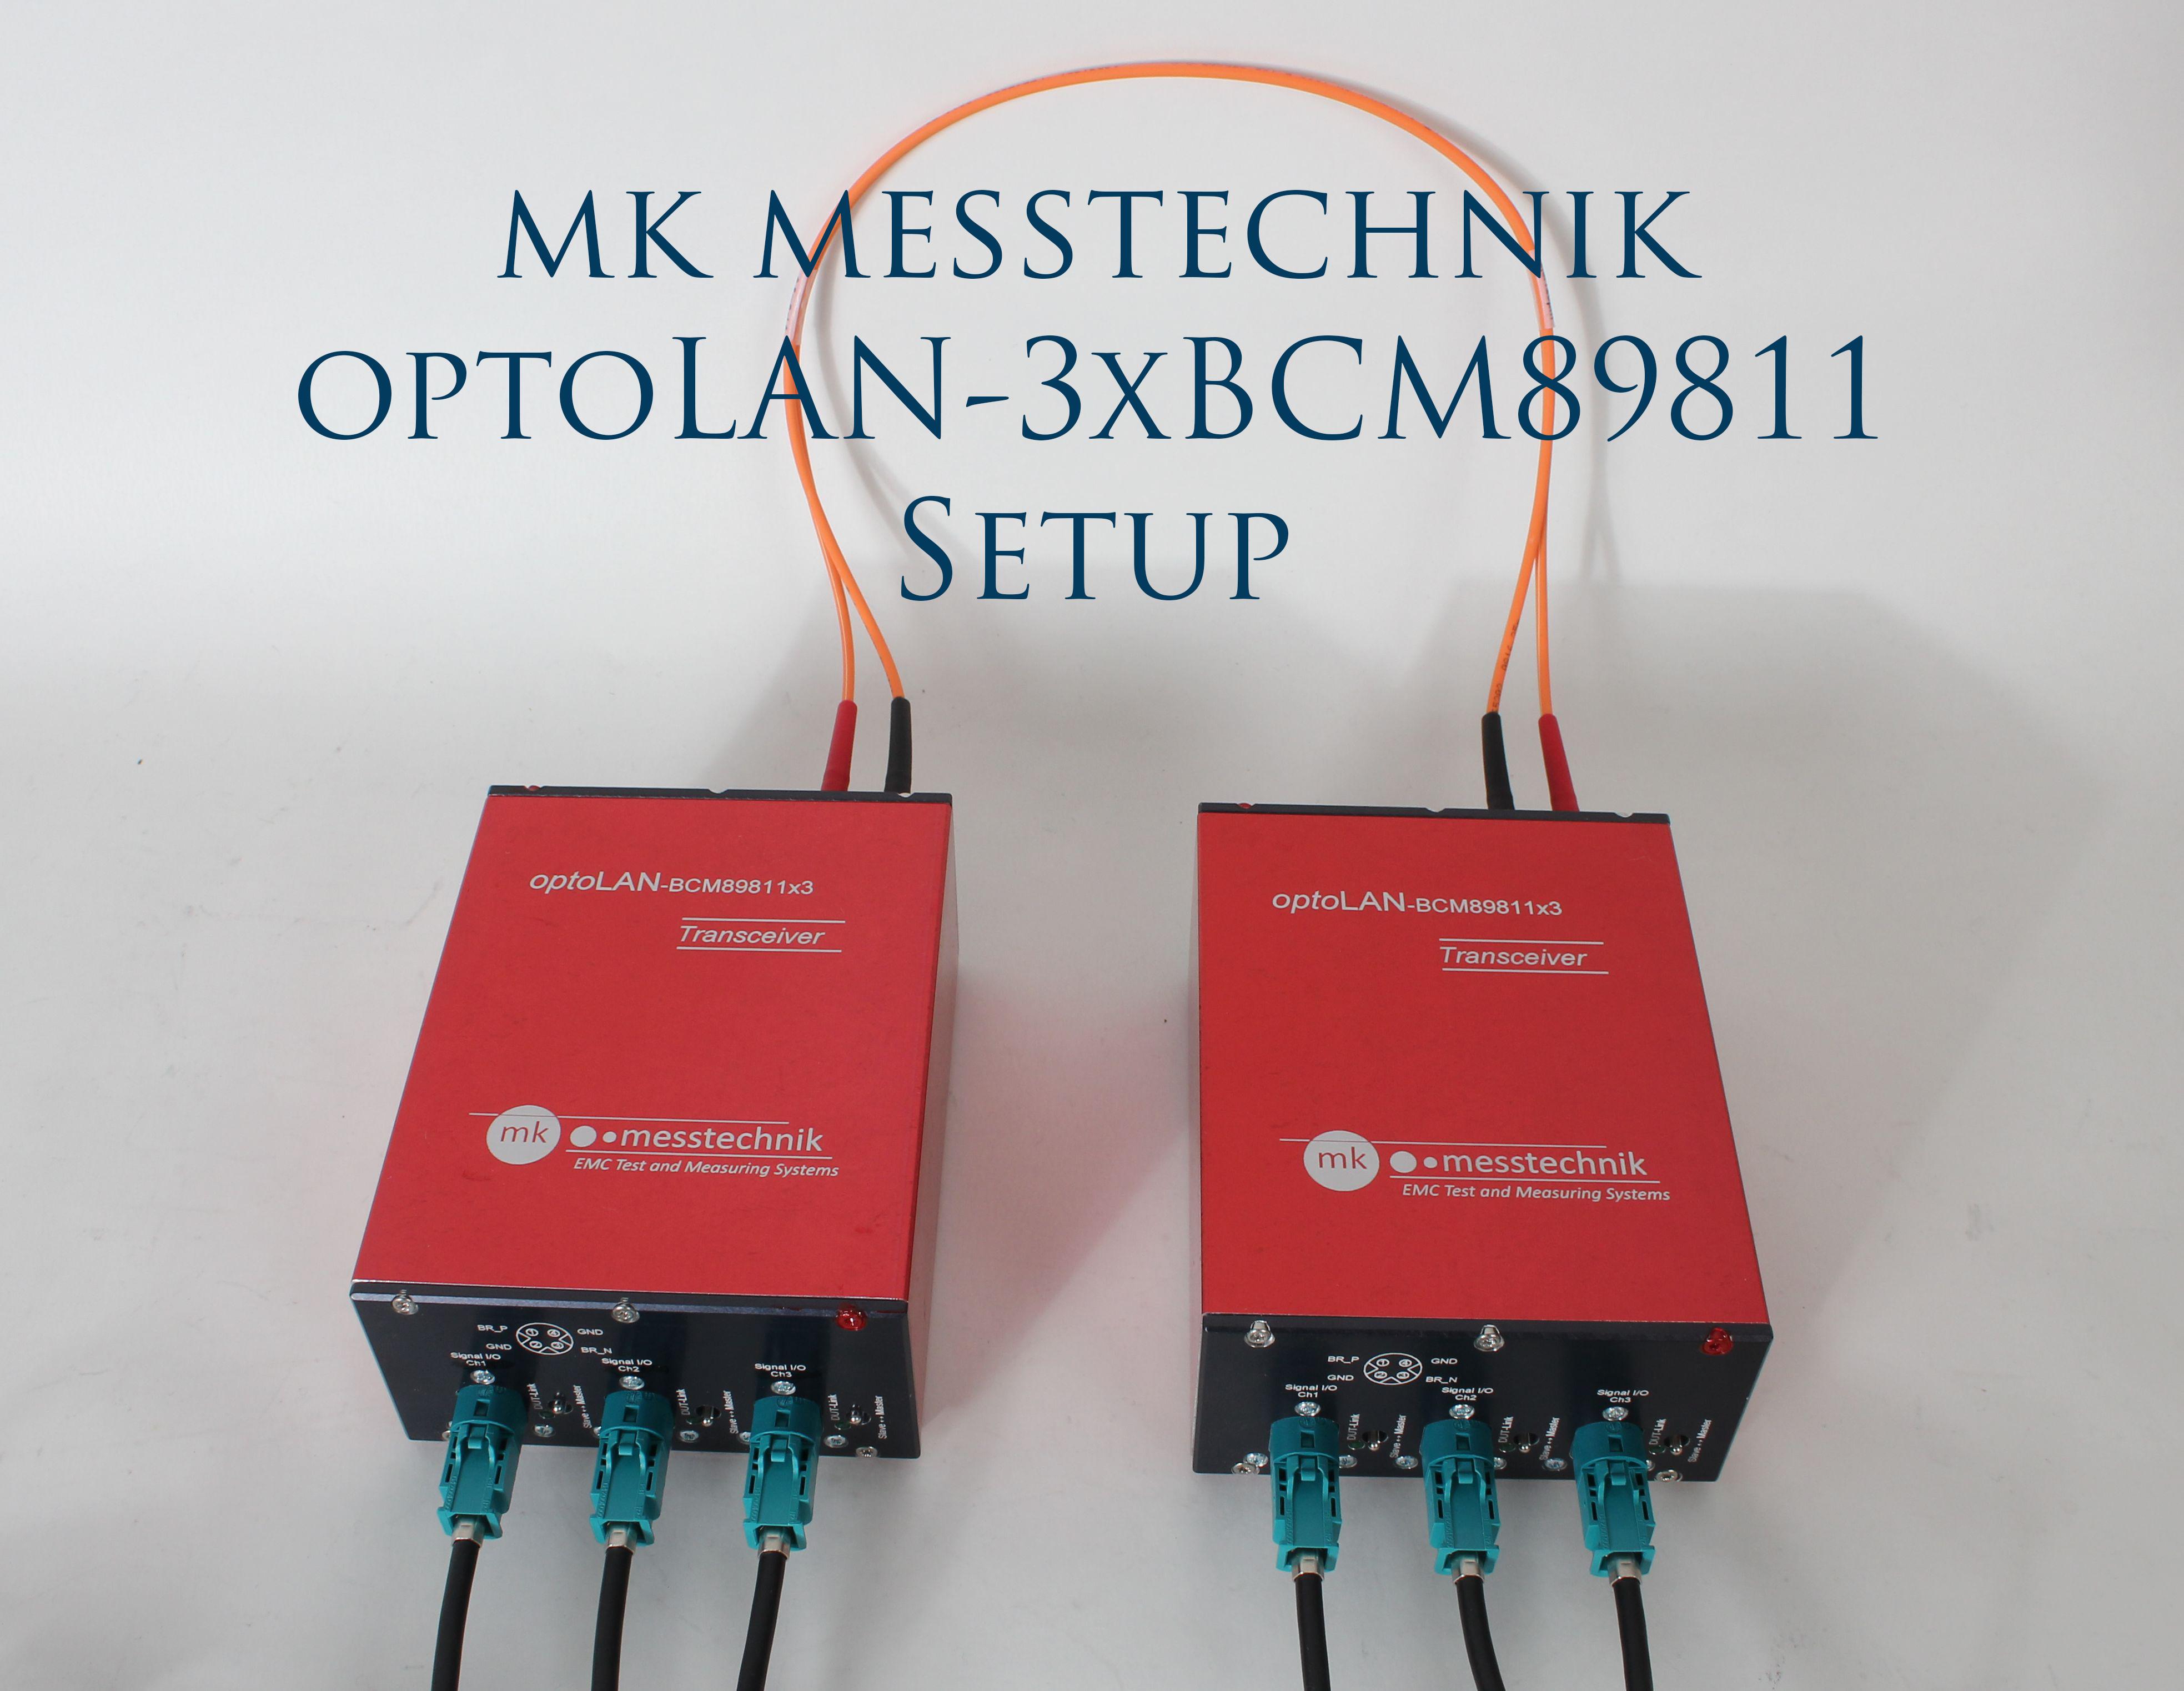 mk messtechnik Automotive Products